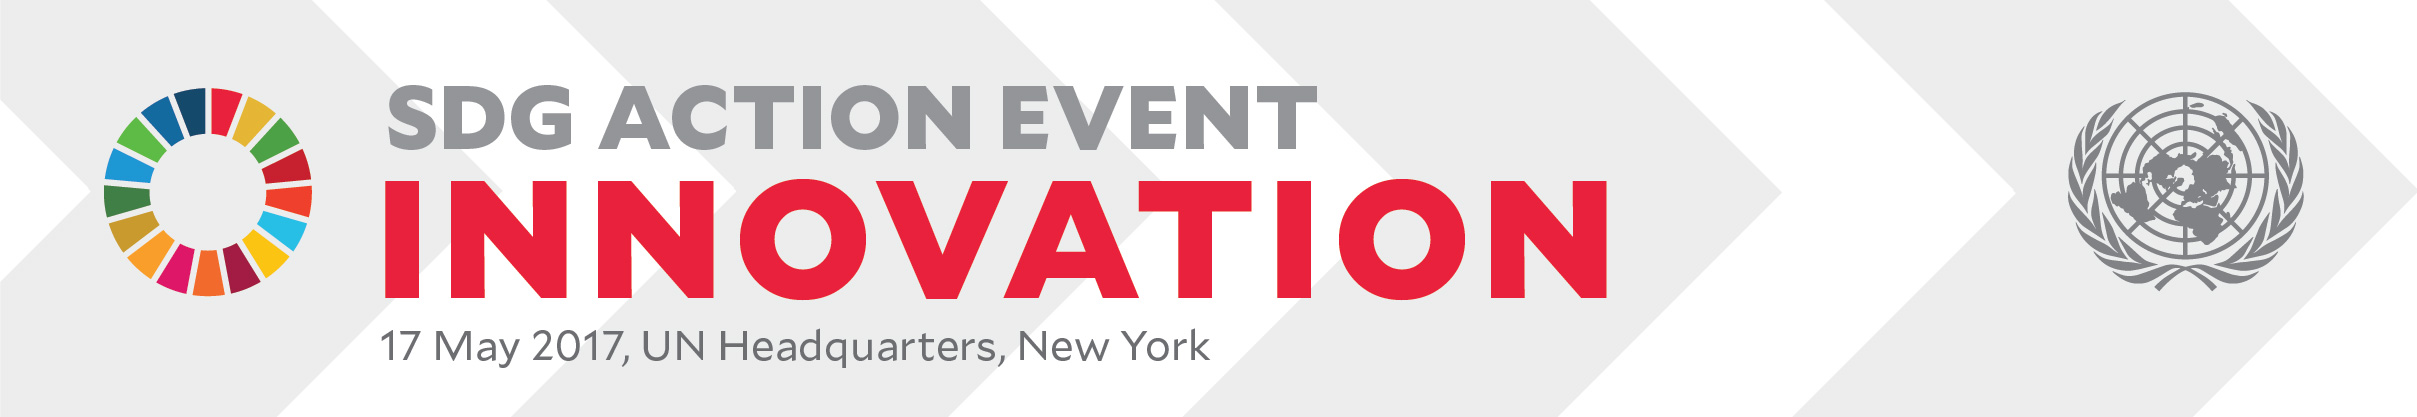 SDG_action_event_innovation_web_banner